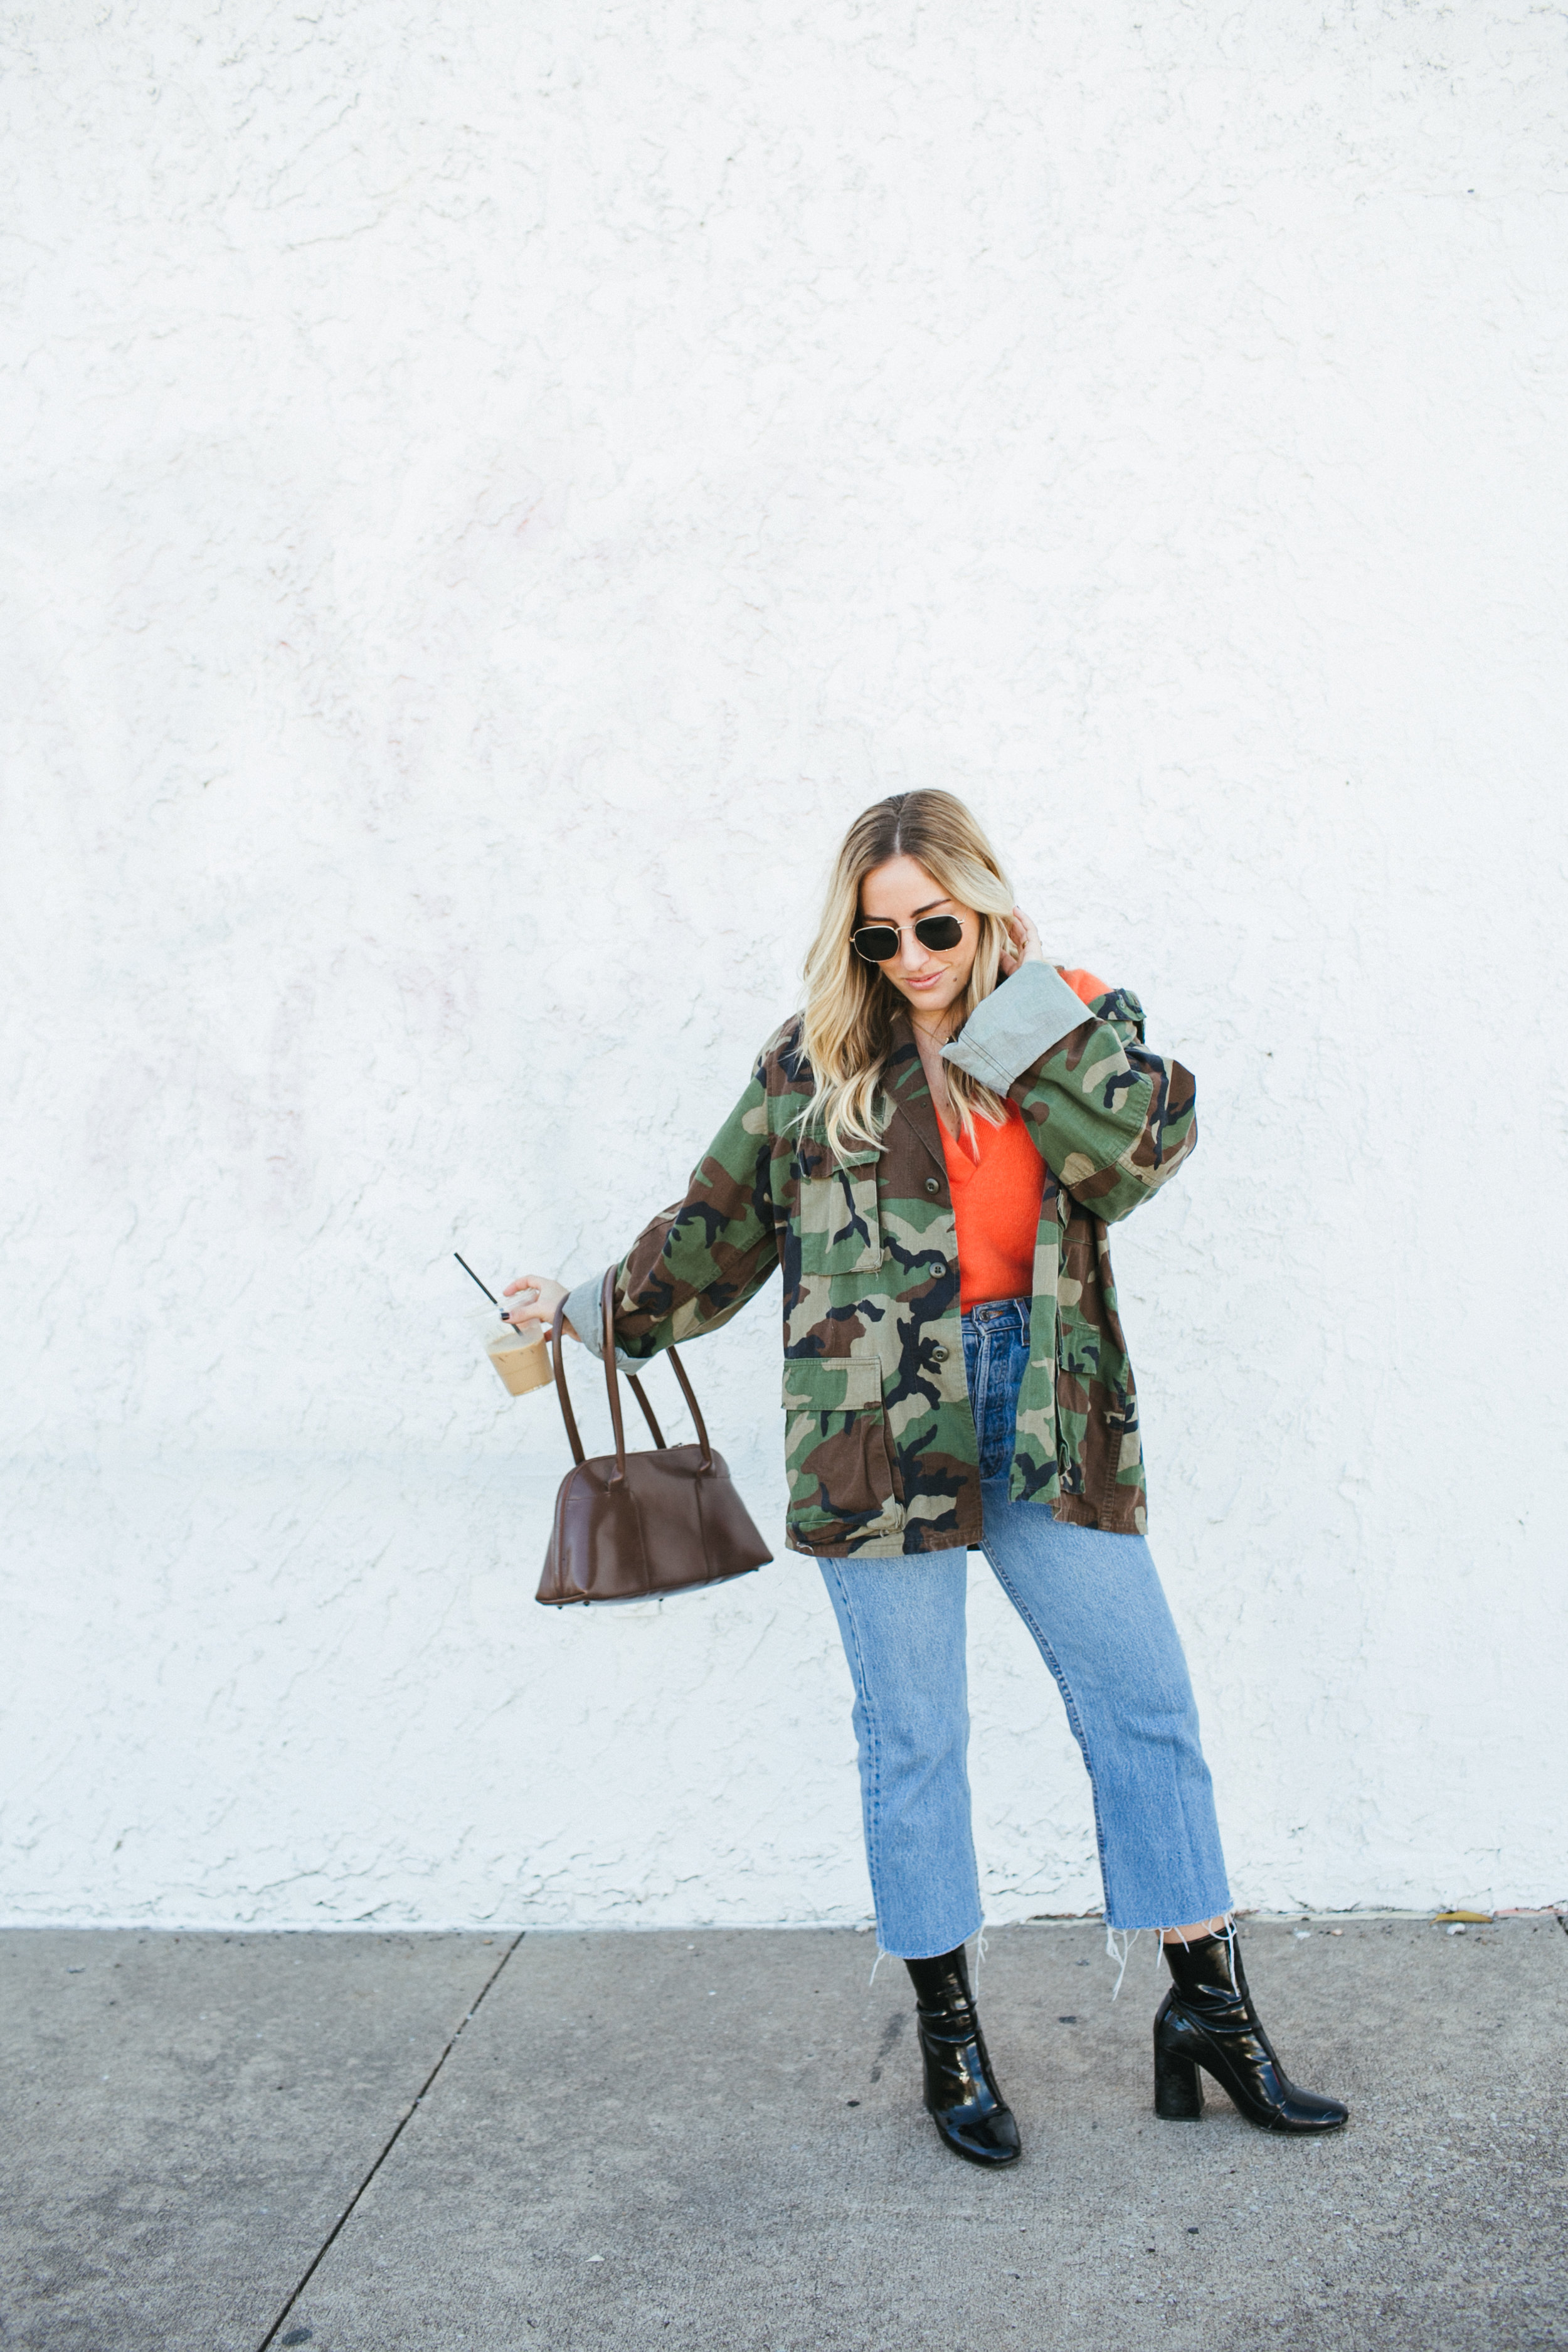 Paige-Newton-Lifestyle-Fashion-Blogger-Influencer-Photography-035.jpg